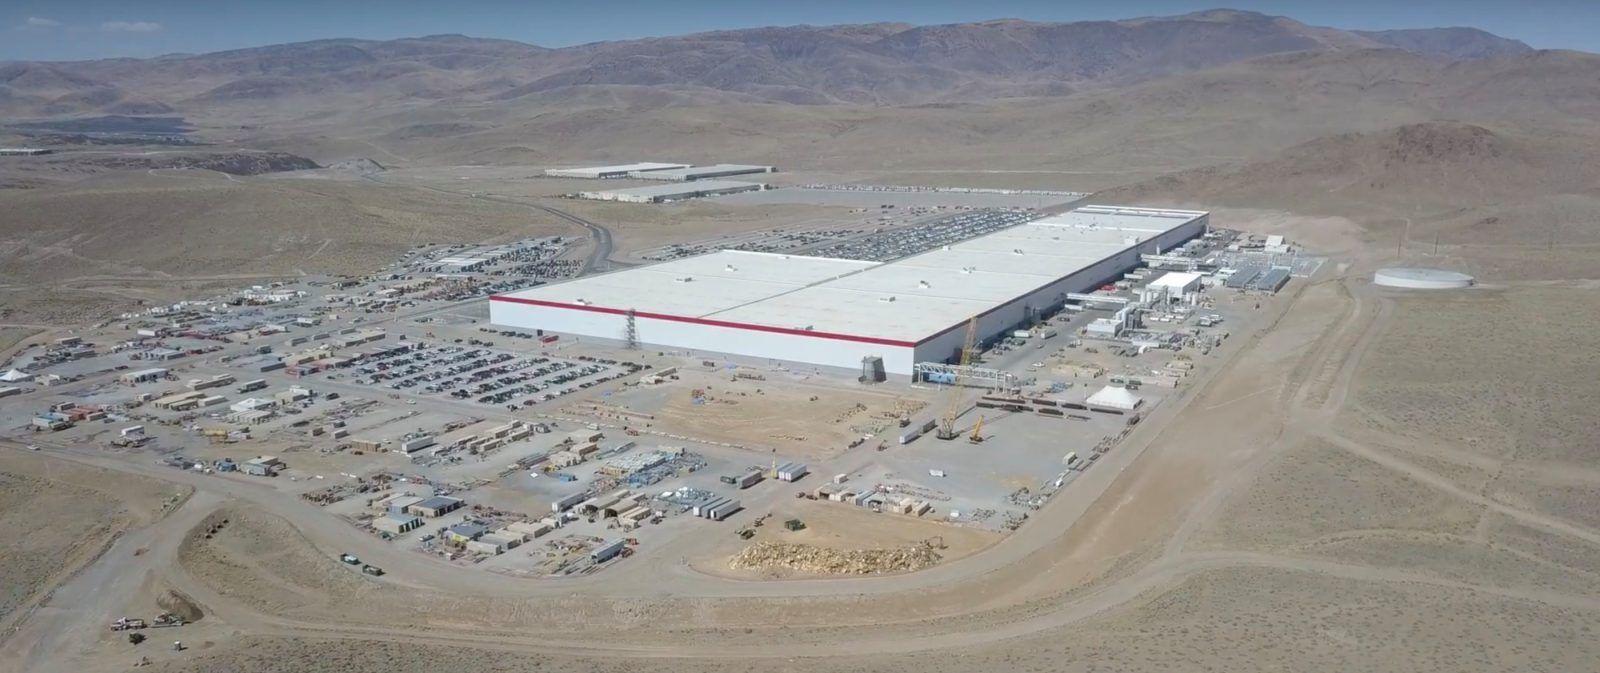 Tesla Gigafactory 1 New Drone Flyover Shows Latest Massive Solar Array Progress Tesla Tesla For Sale Tesla Model